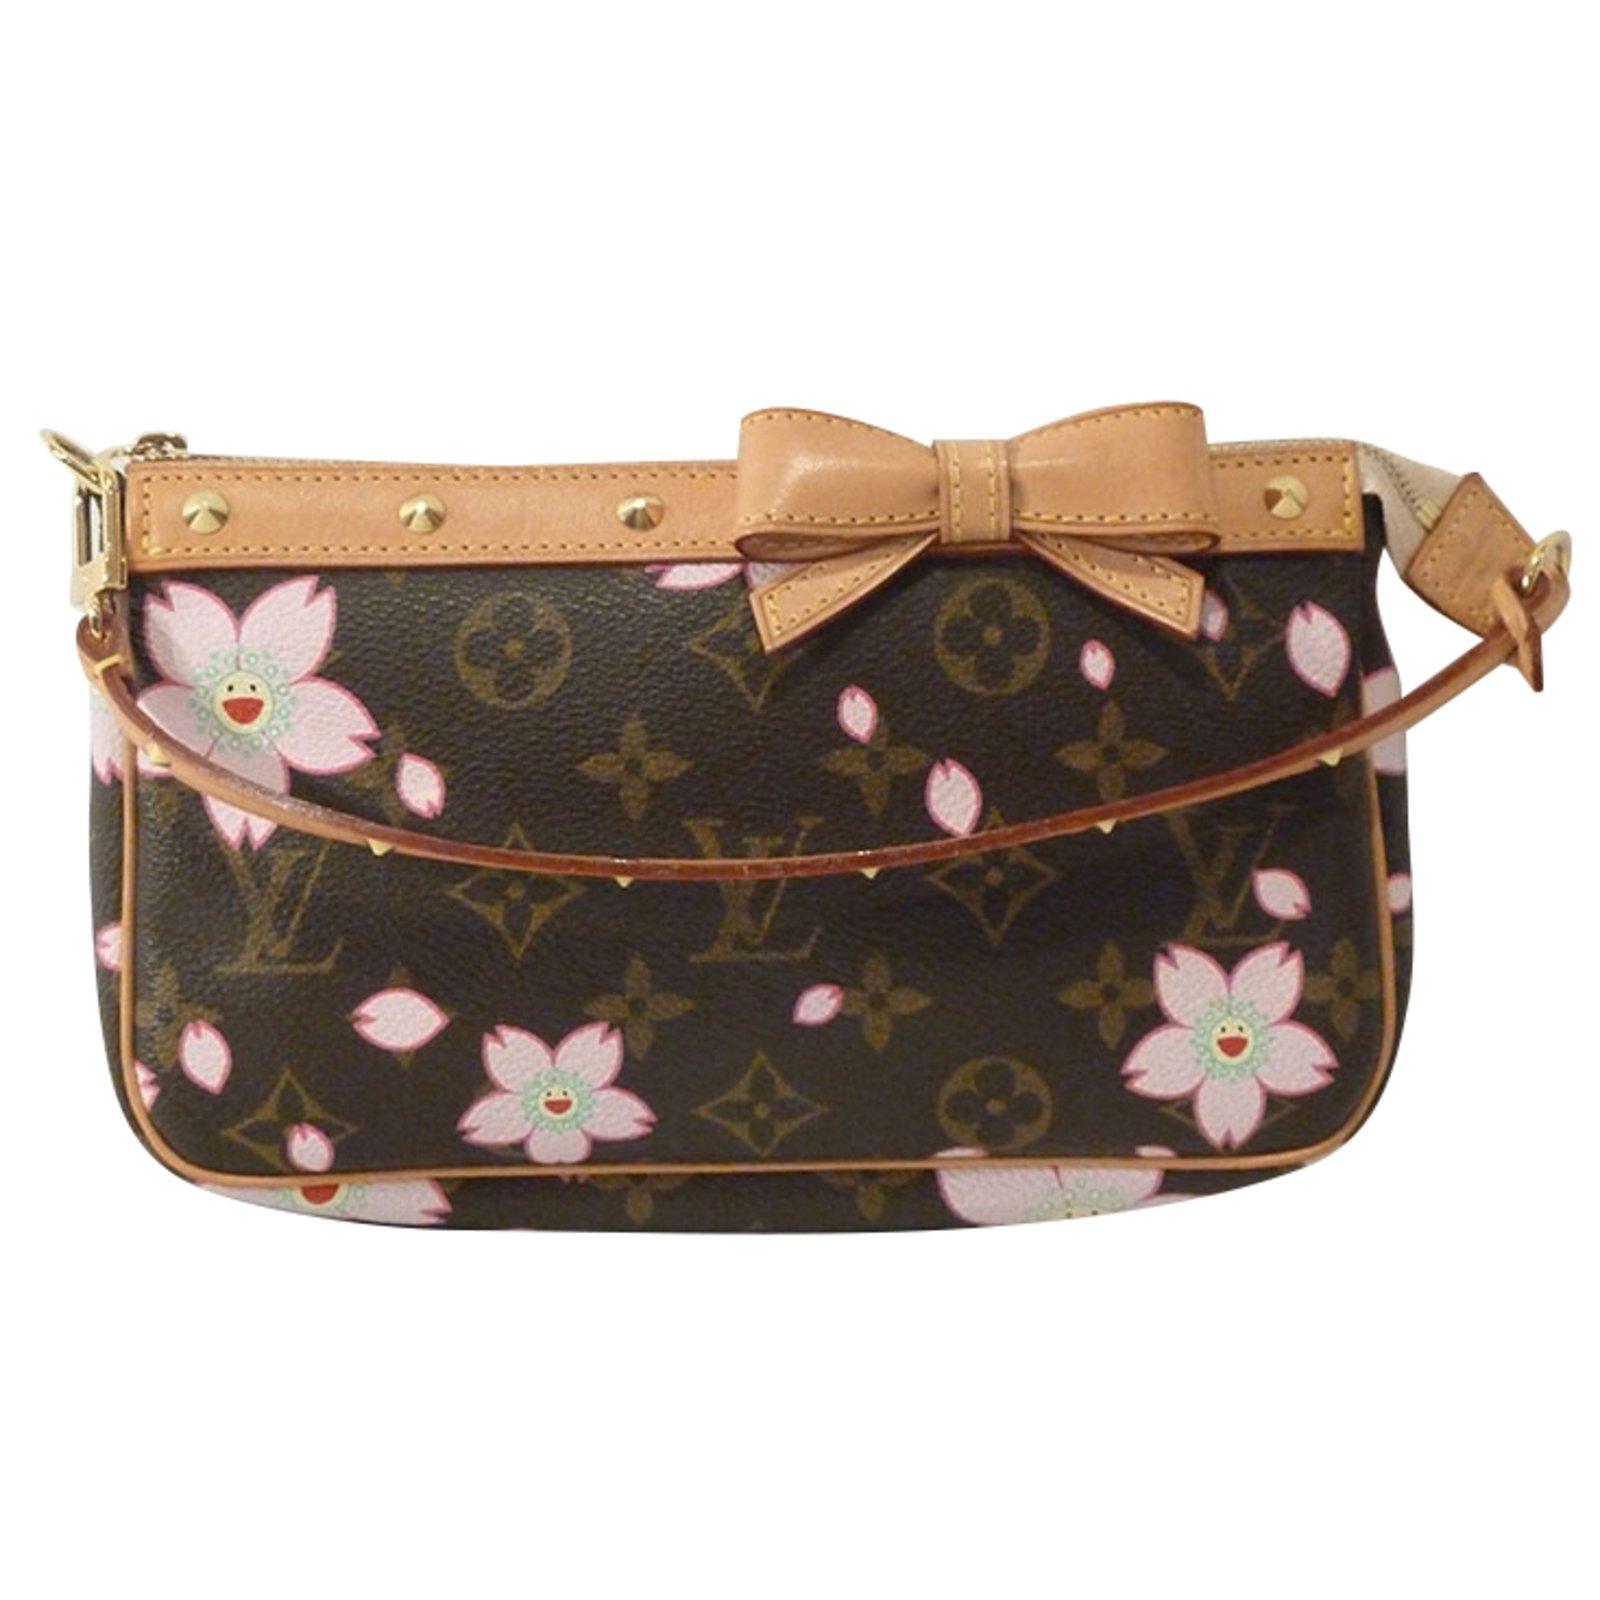 Louis vuitton takashi murakami cherry blossom monogram stud pochette  shoulder bag handbags other brown ref jpg cbc7722f09da8